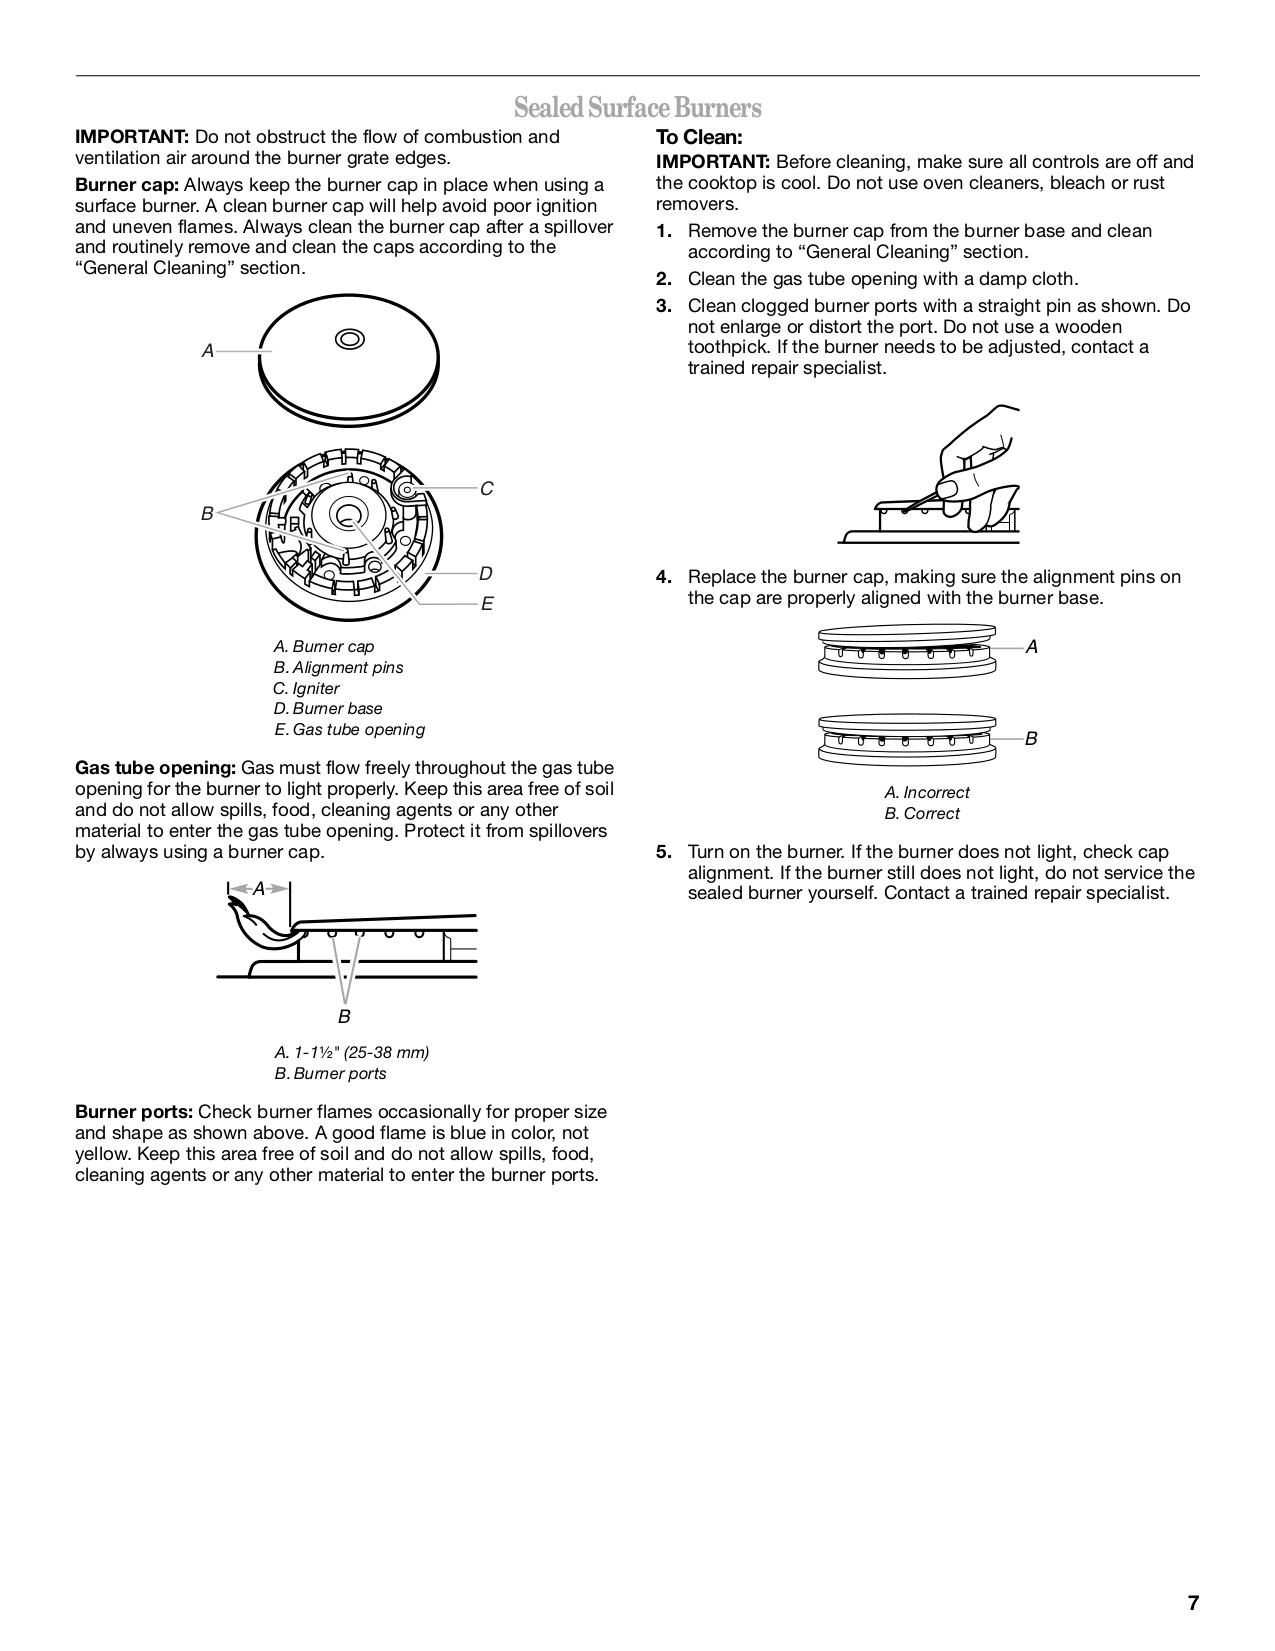 PDF manual for Whirlpool Range W3CG3014XS